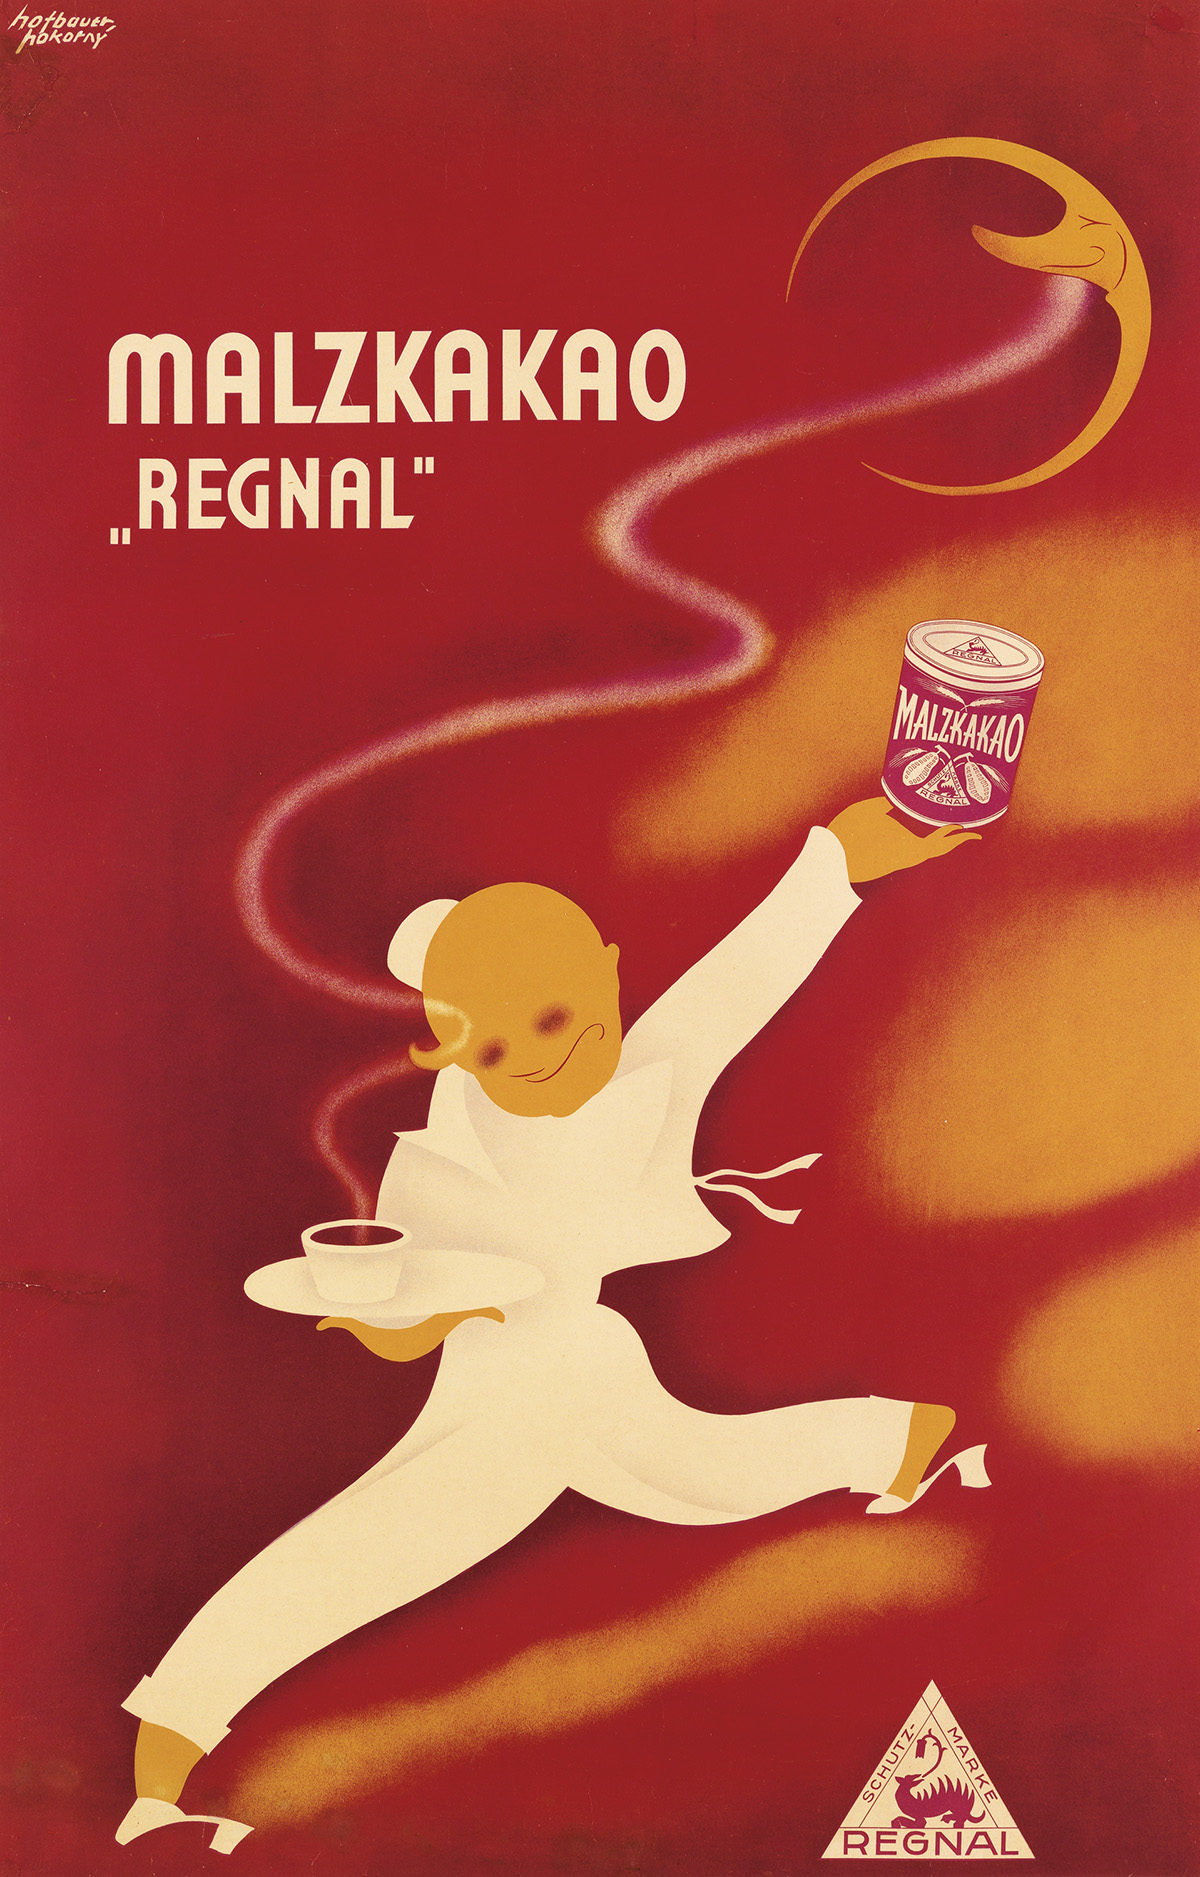 HOFBAUER-POKORNY-(DATES-UNKNOWN)-MALZKAKAO-REGNAL-Circa-1935